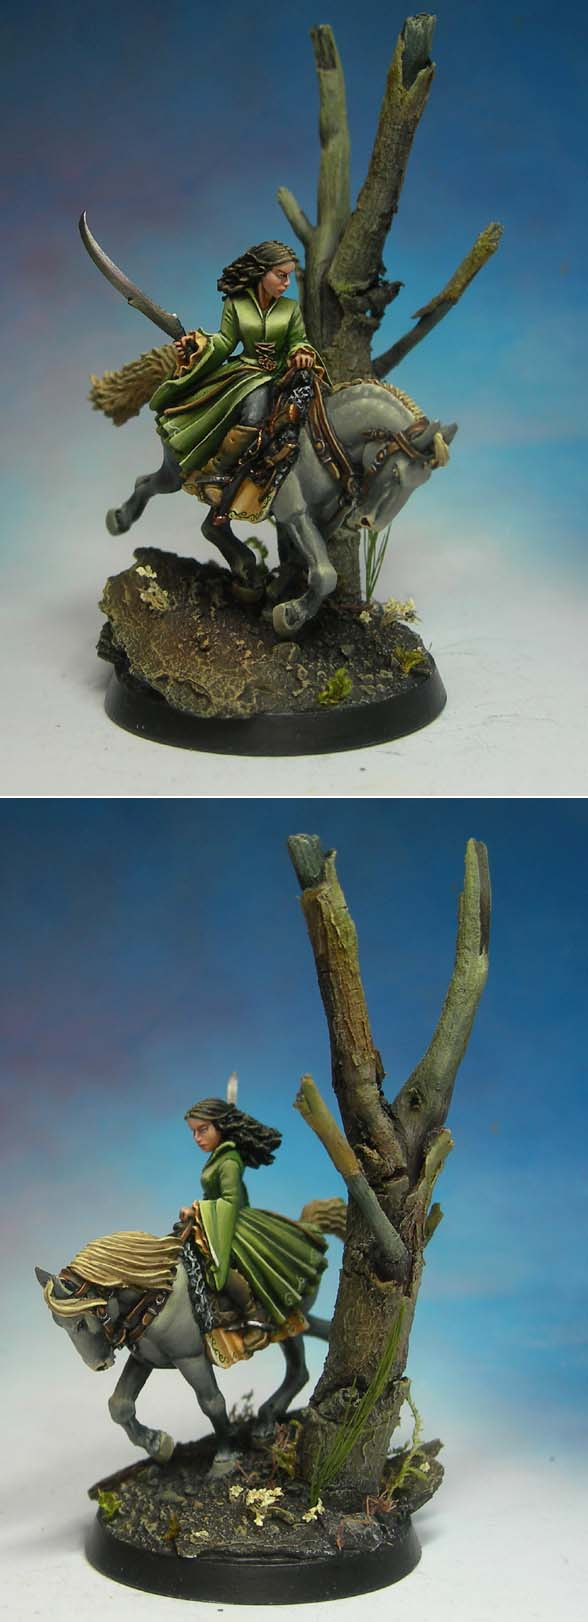 Coups de coeur Figurines du Bien Winterfell Img46b10